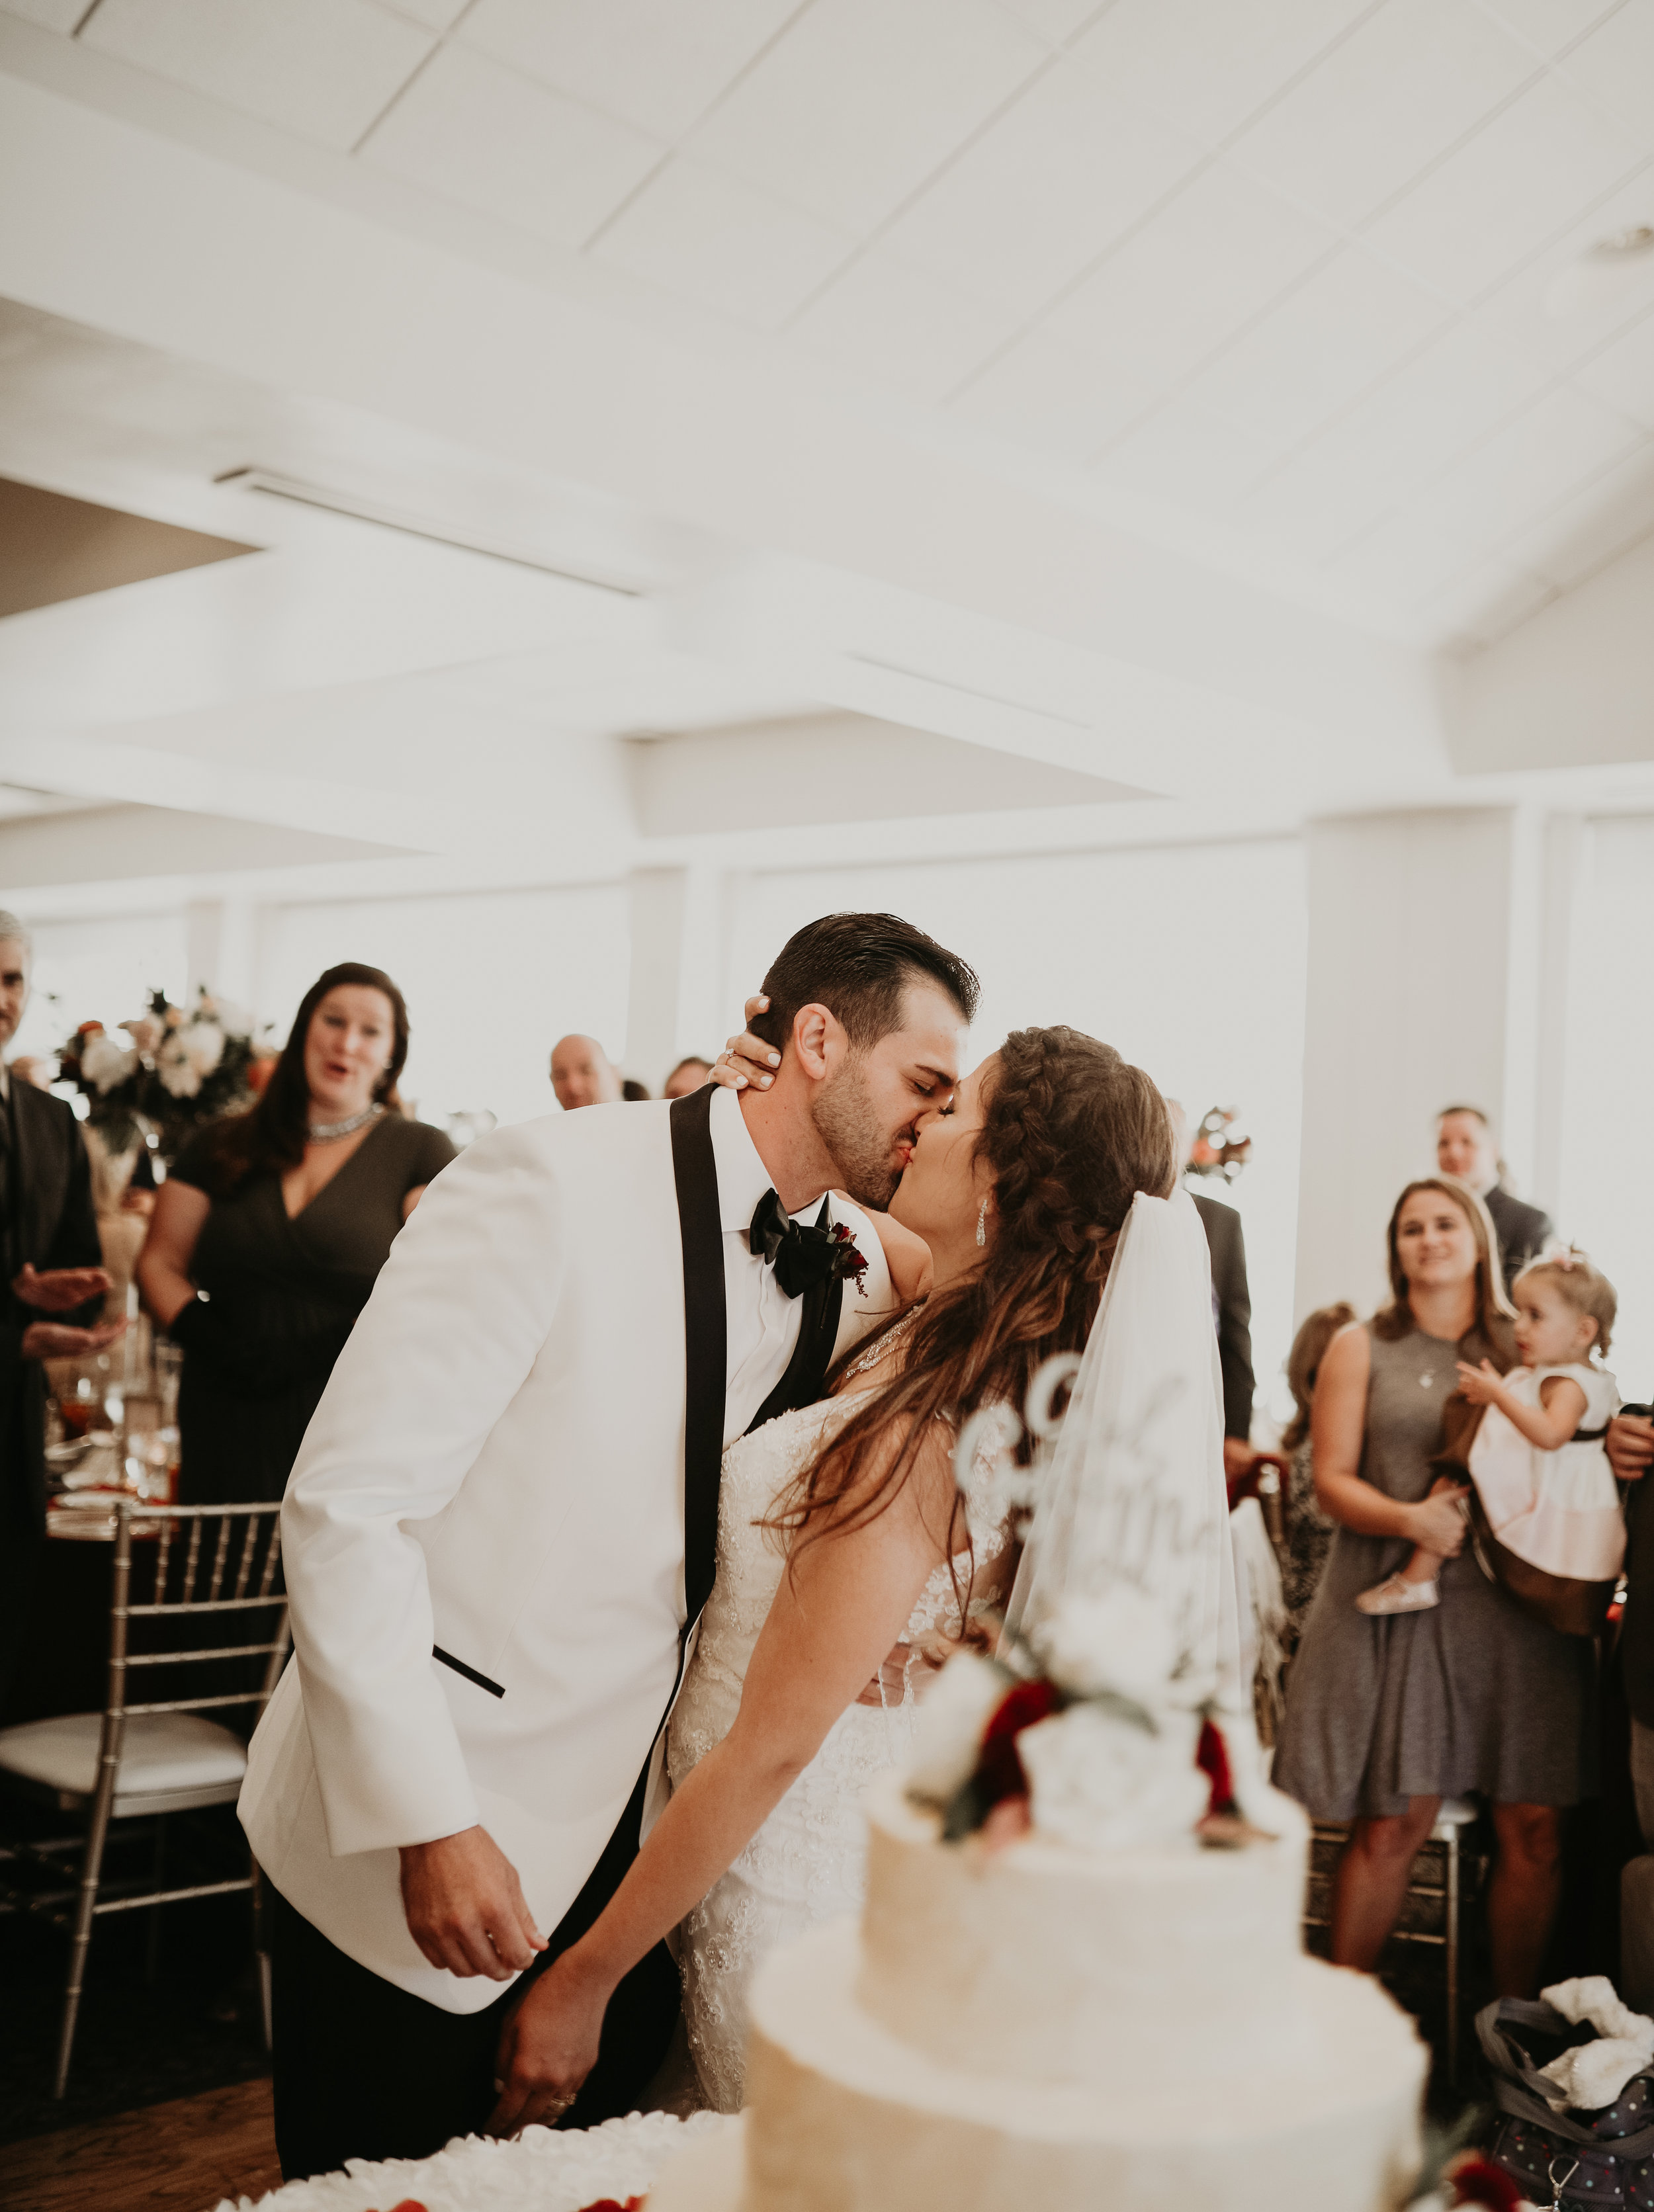 Gina + Ronnie Wedding